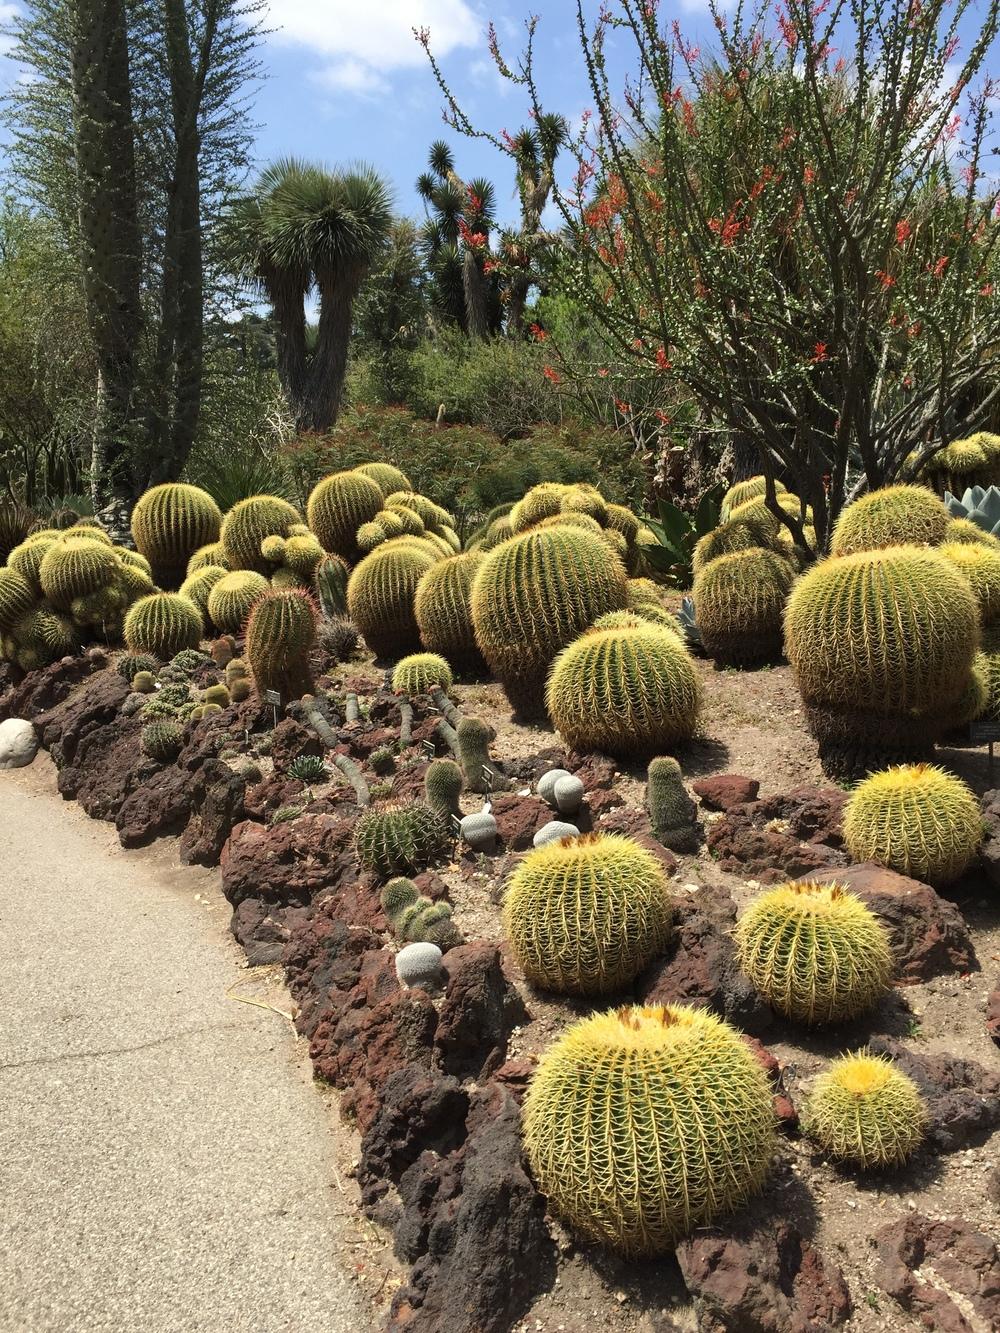 CALIFORNIA LIKE A LOCAL: A VISIT TO THE HUNTINGTON BOTANICAL GARDENS ...